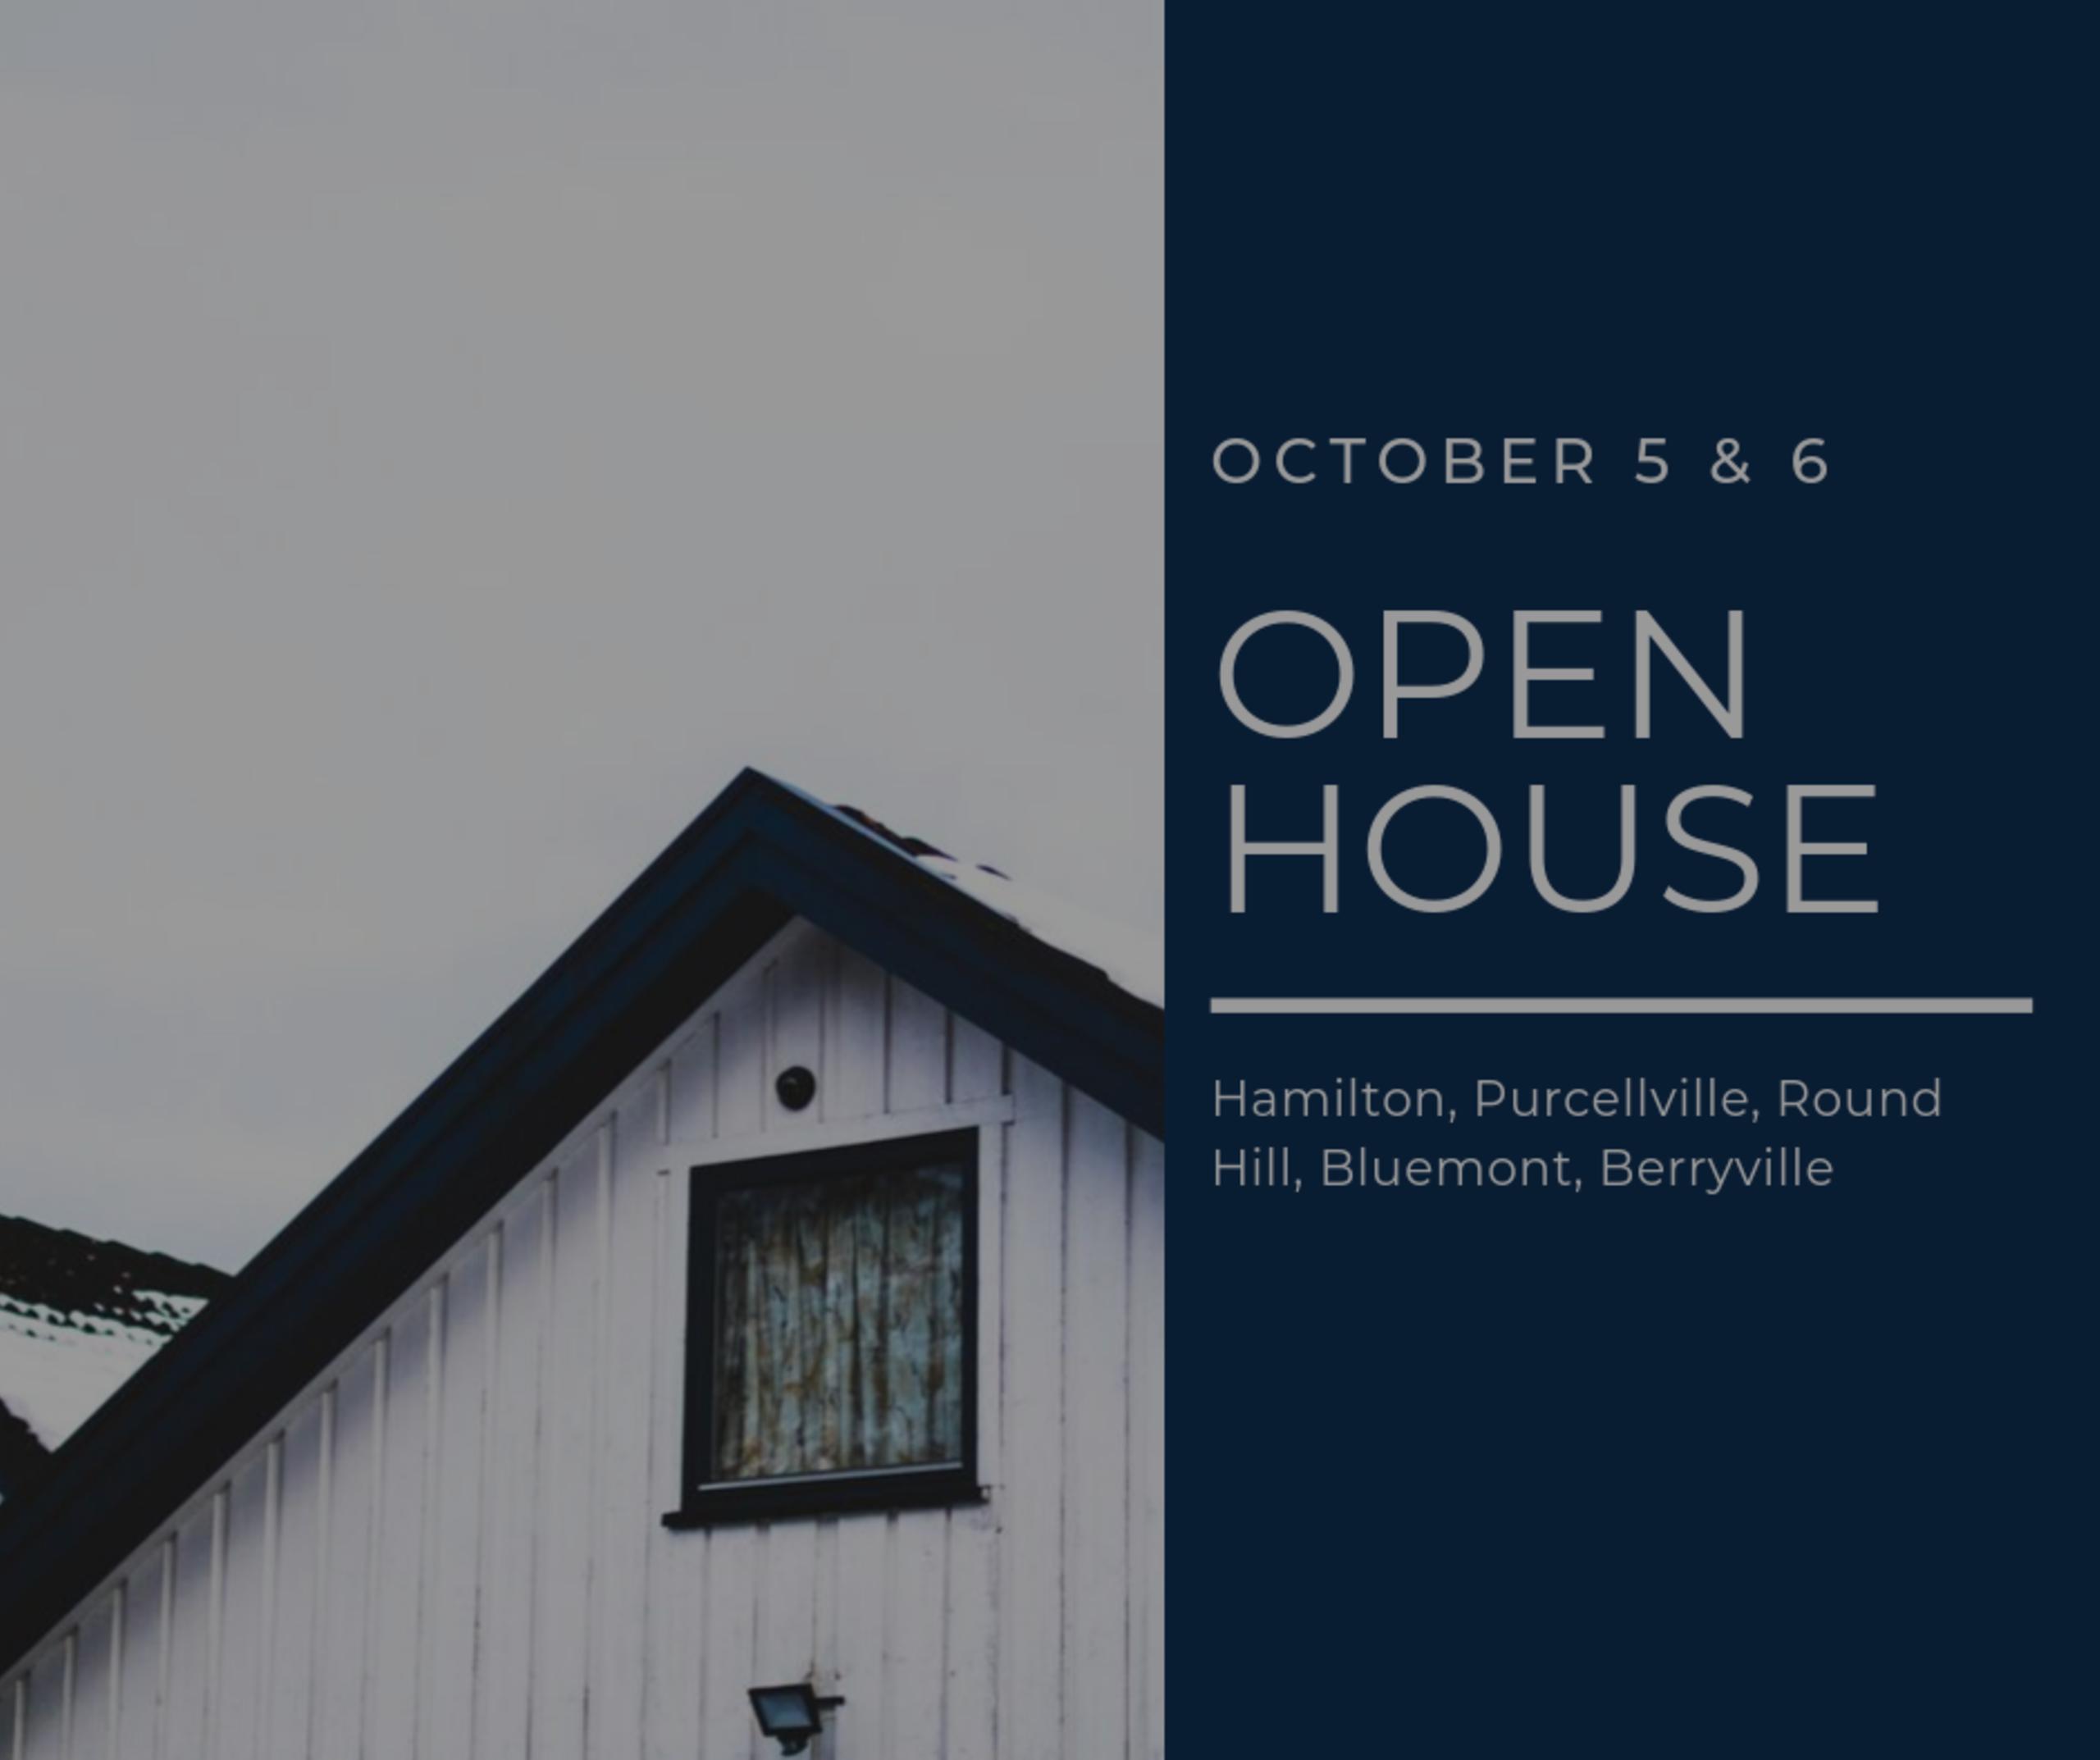 Open House List 10/4/19 – 10/5/19